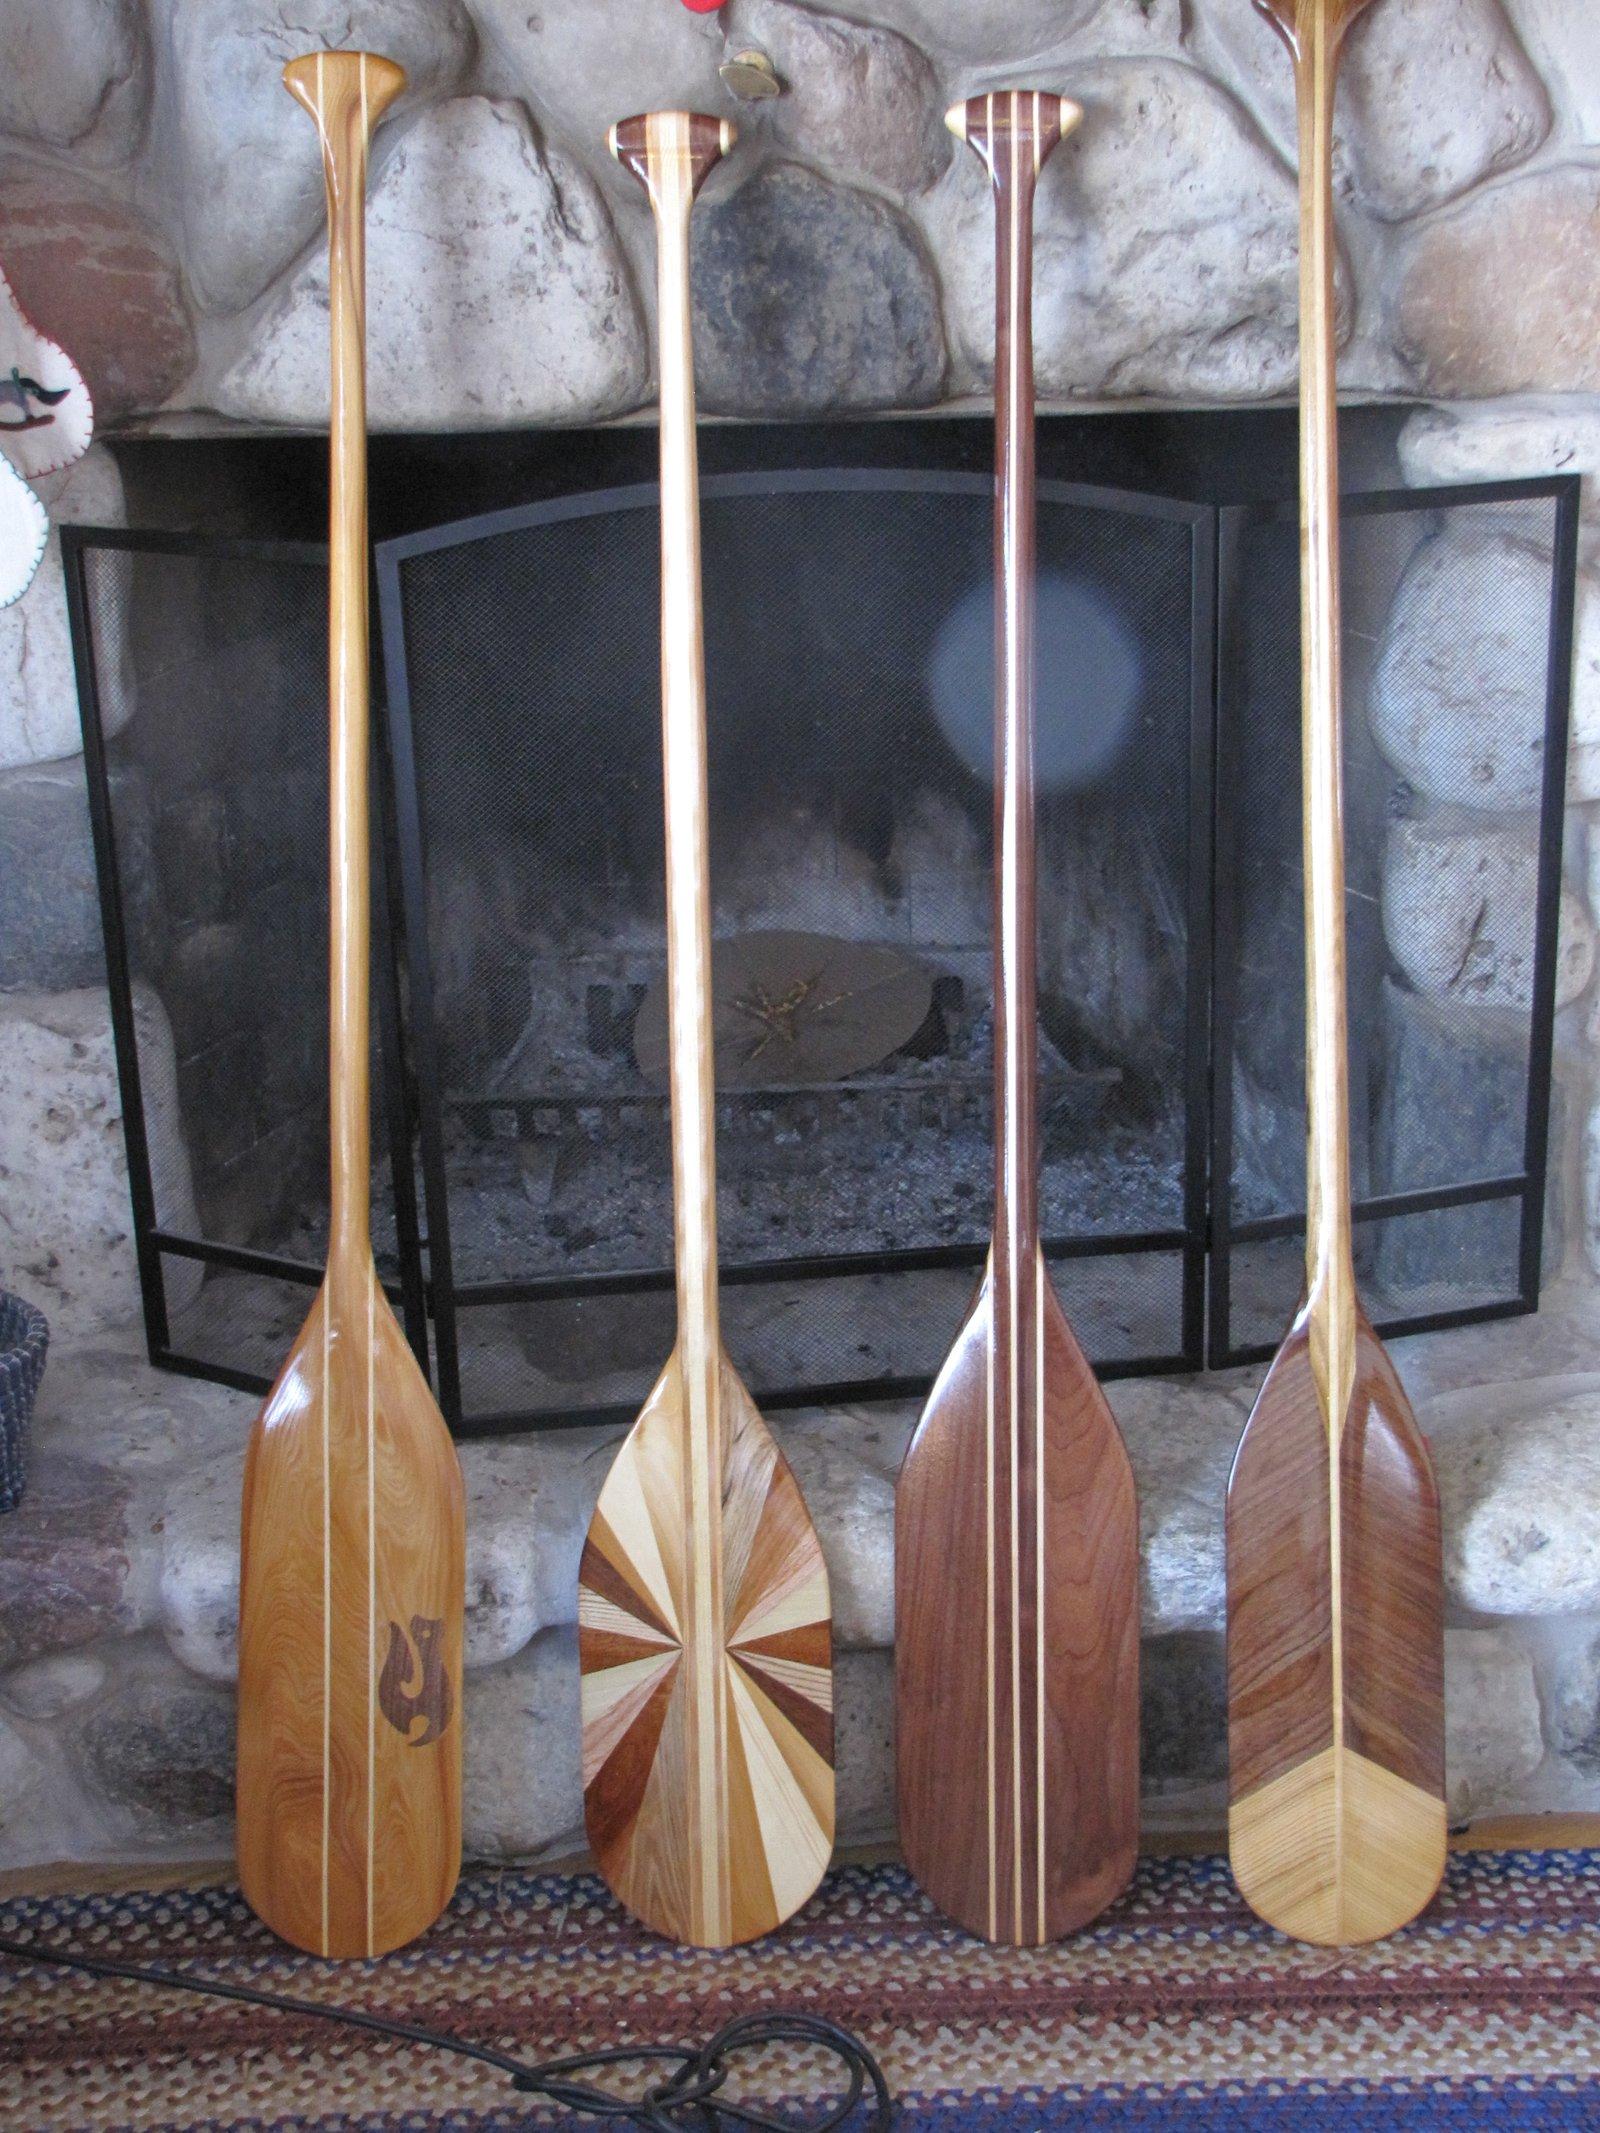 Hand made canoe paddles